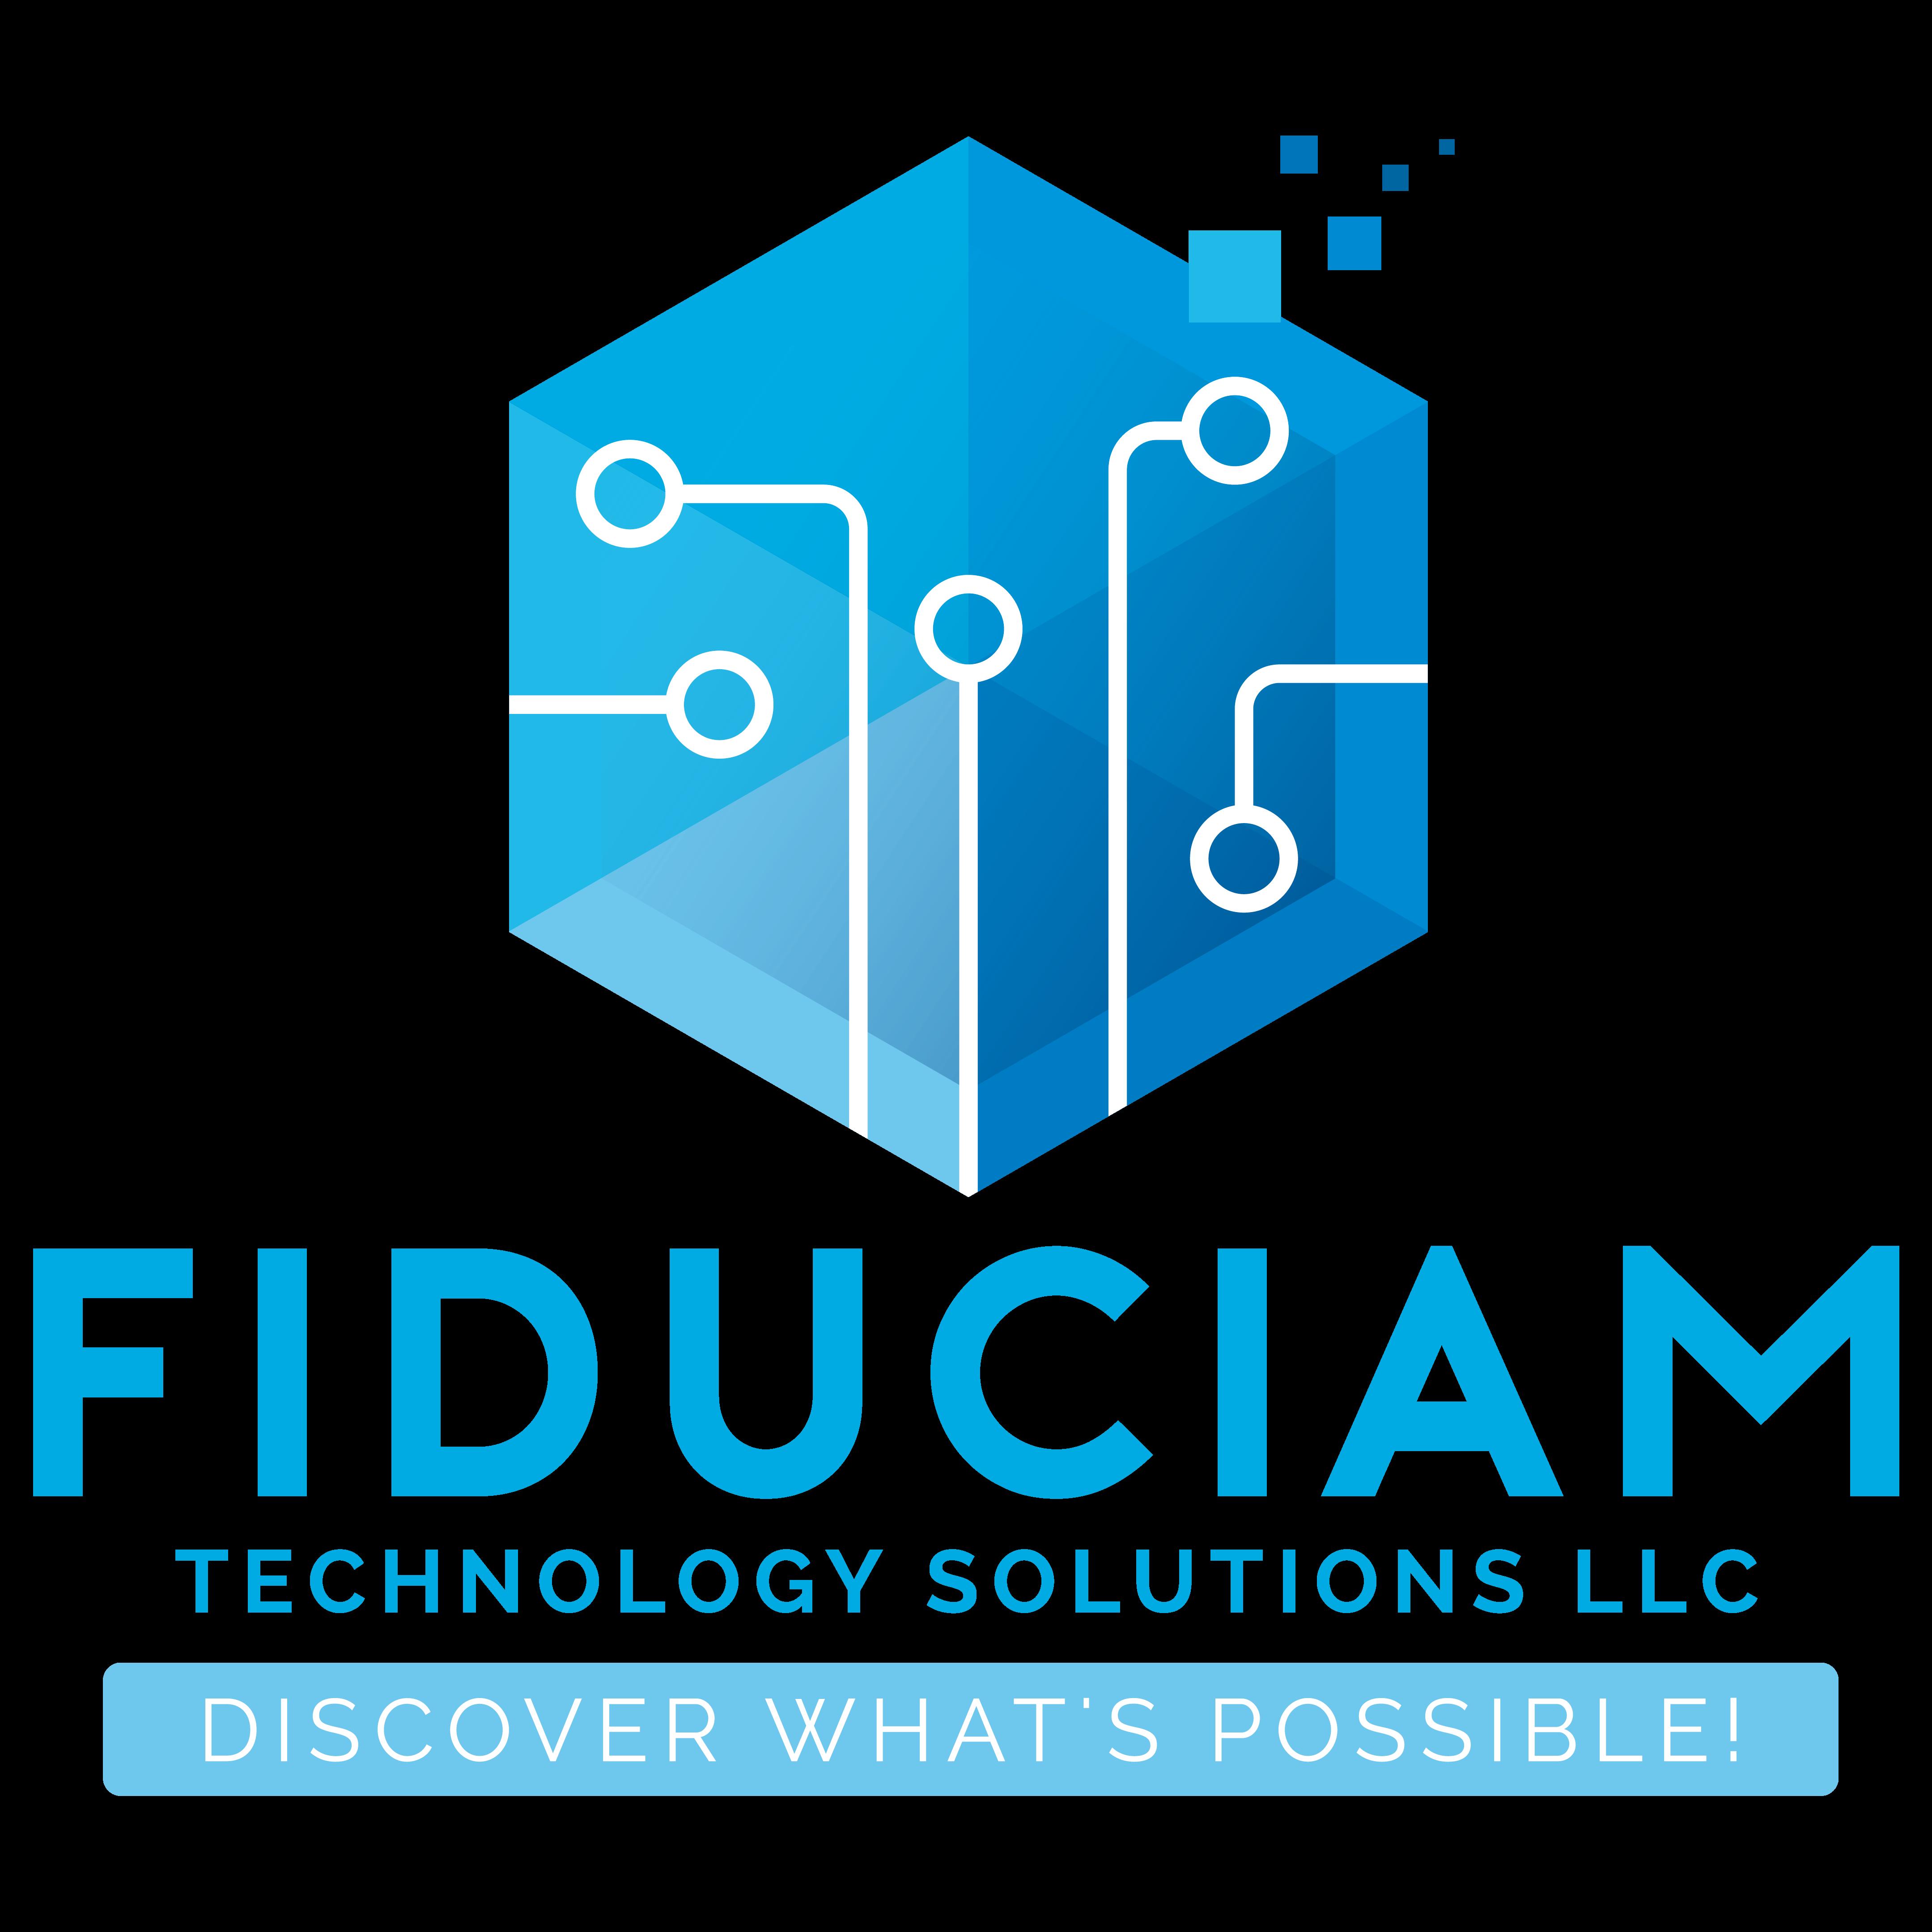 FIDUCIAM Technology Solutions LLC